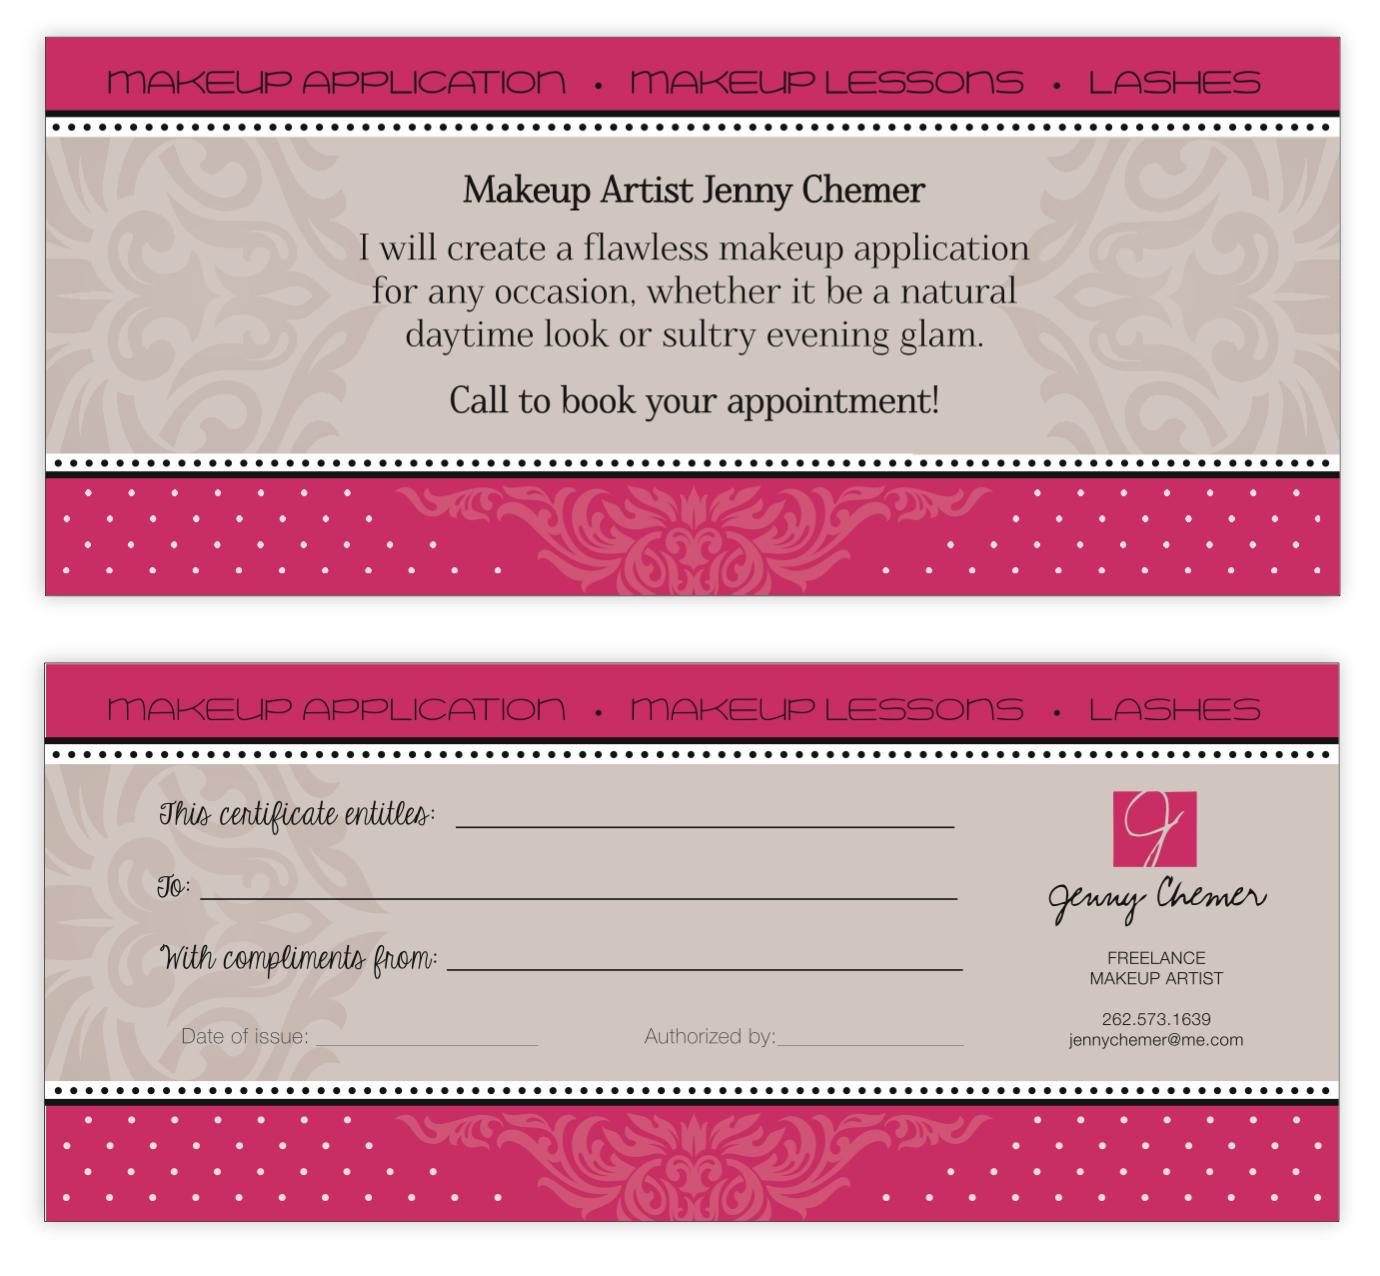 Jenny Makeup gift certificate